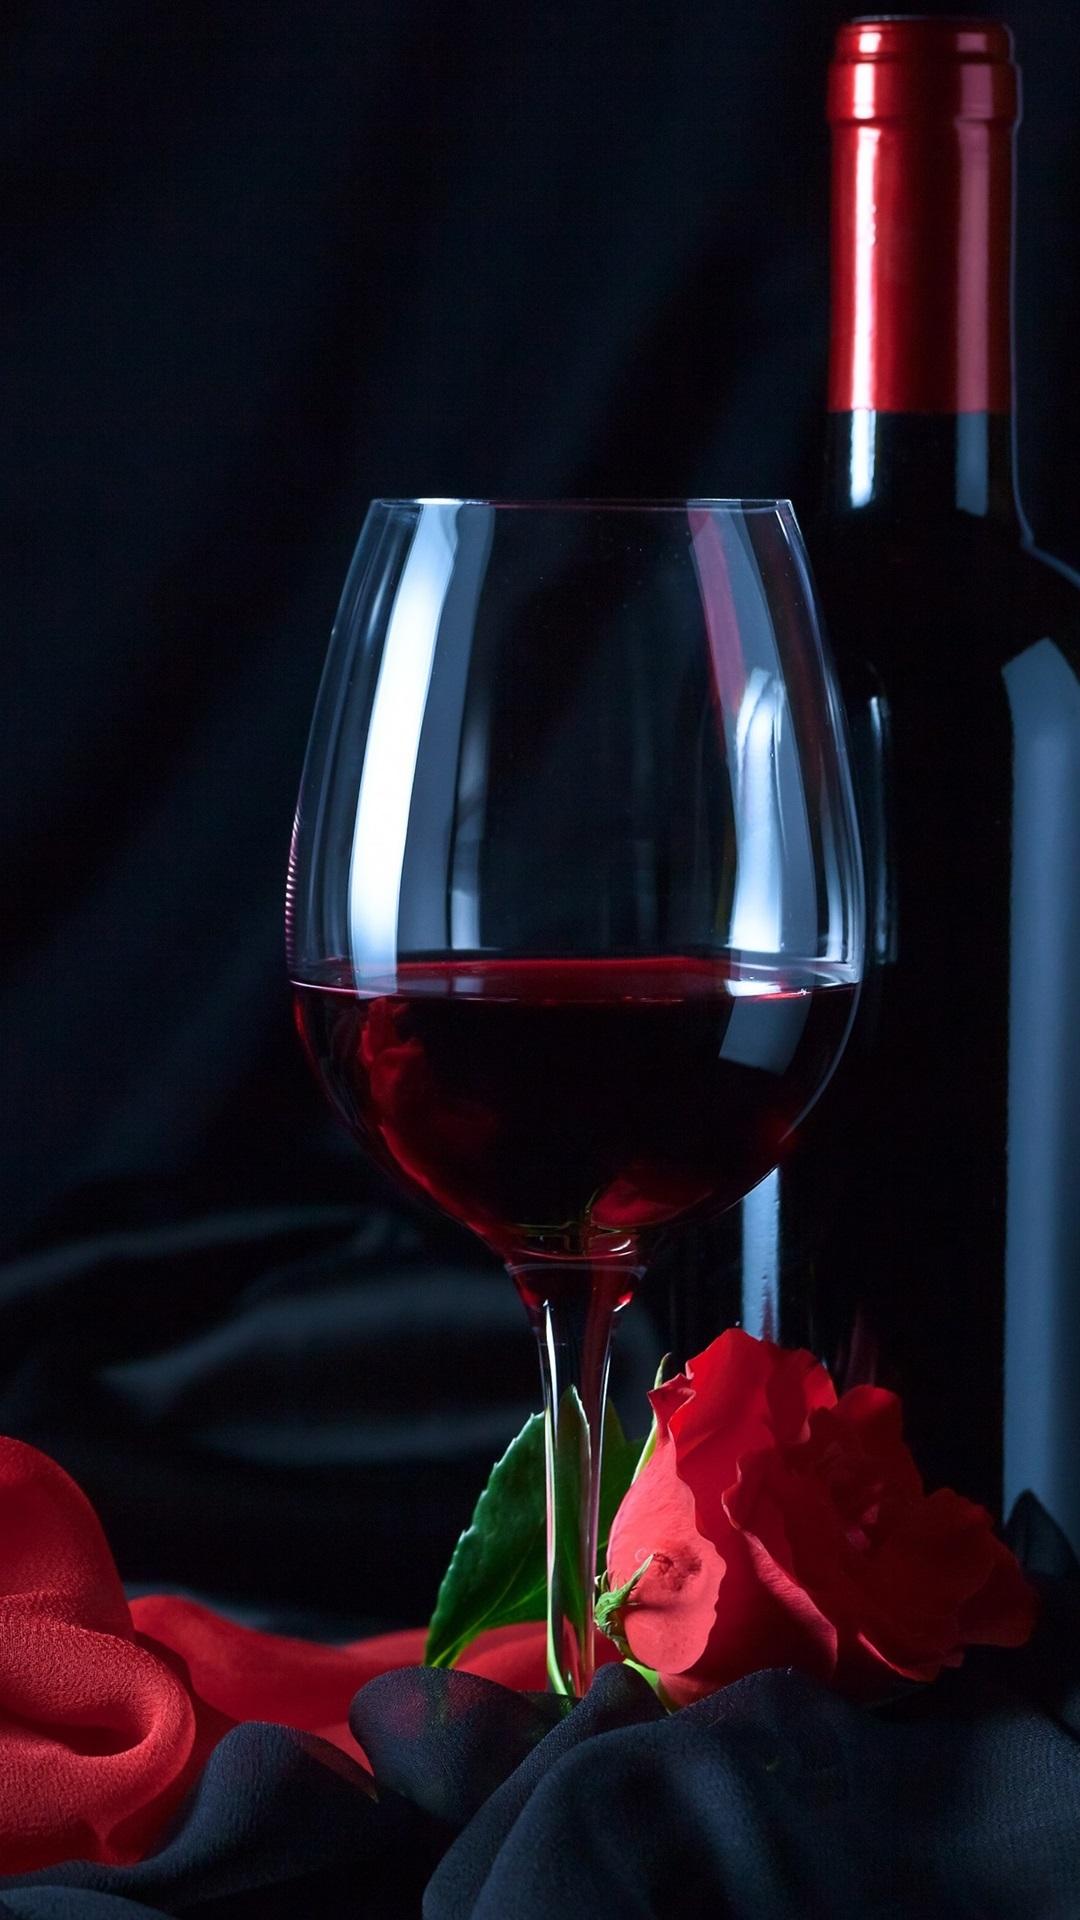 Картинки анимации бокалов с вином, бурундук картинки